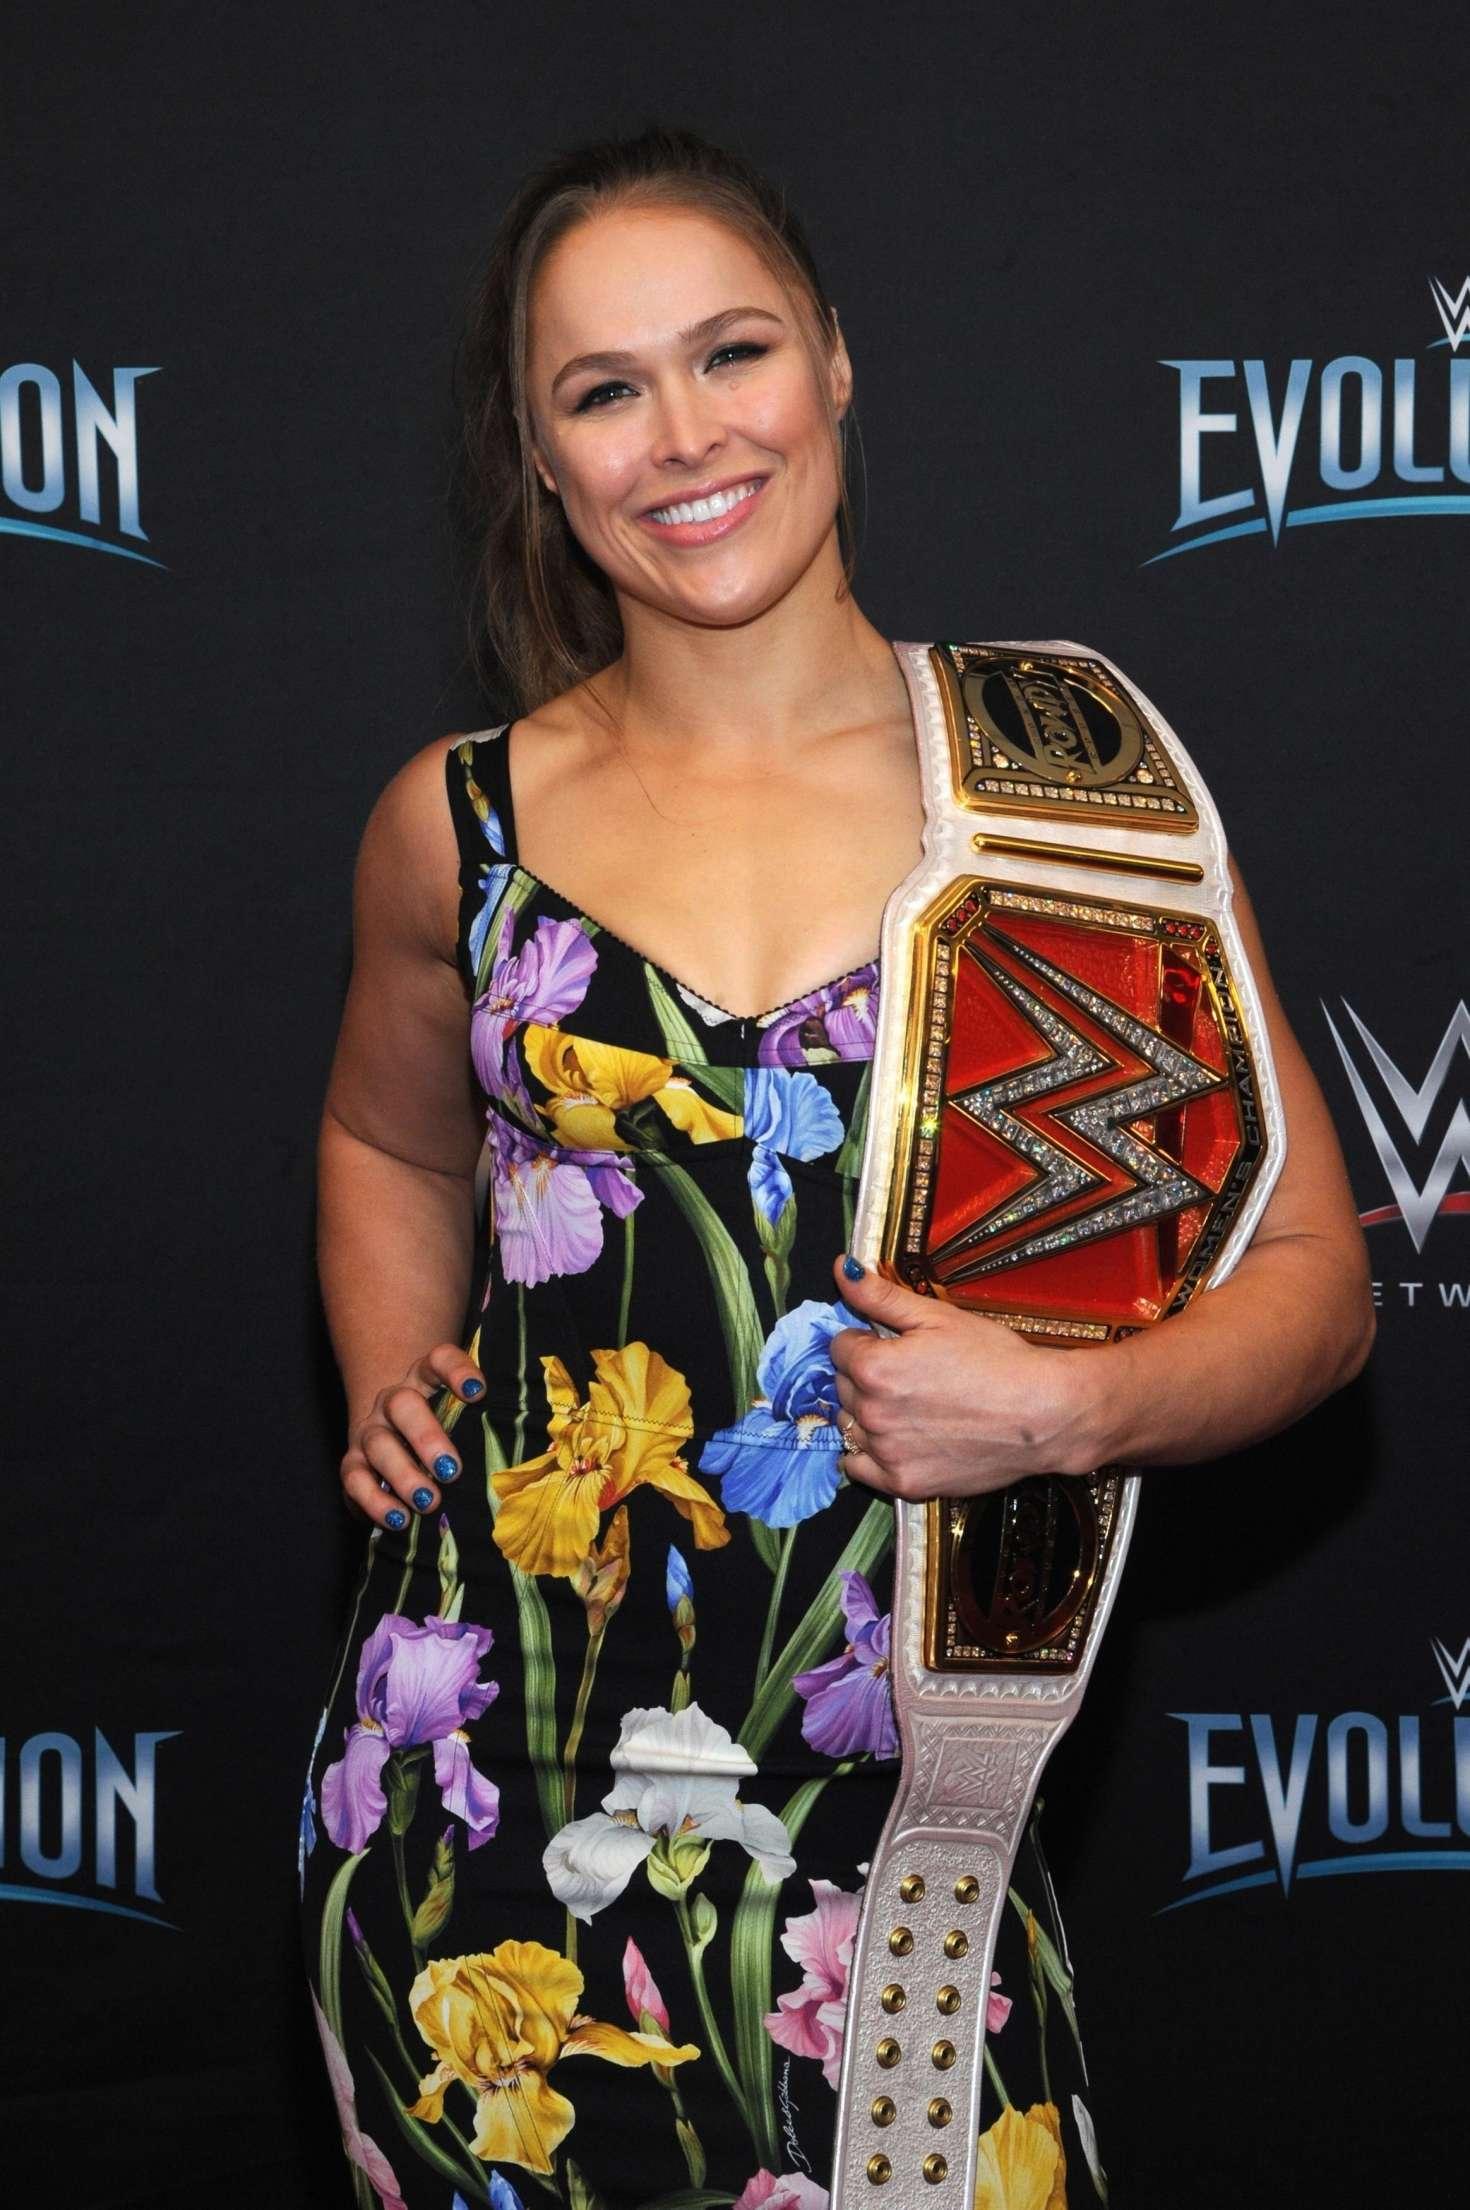 Ronda Rousey - WWE Evolution in New York